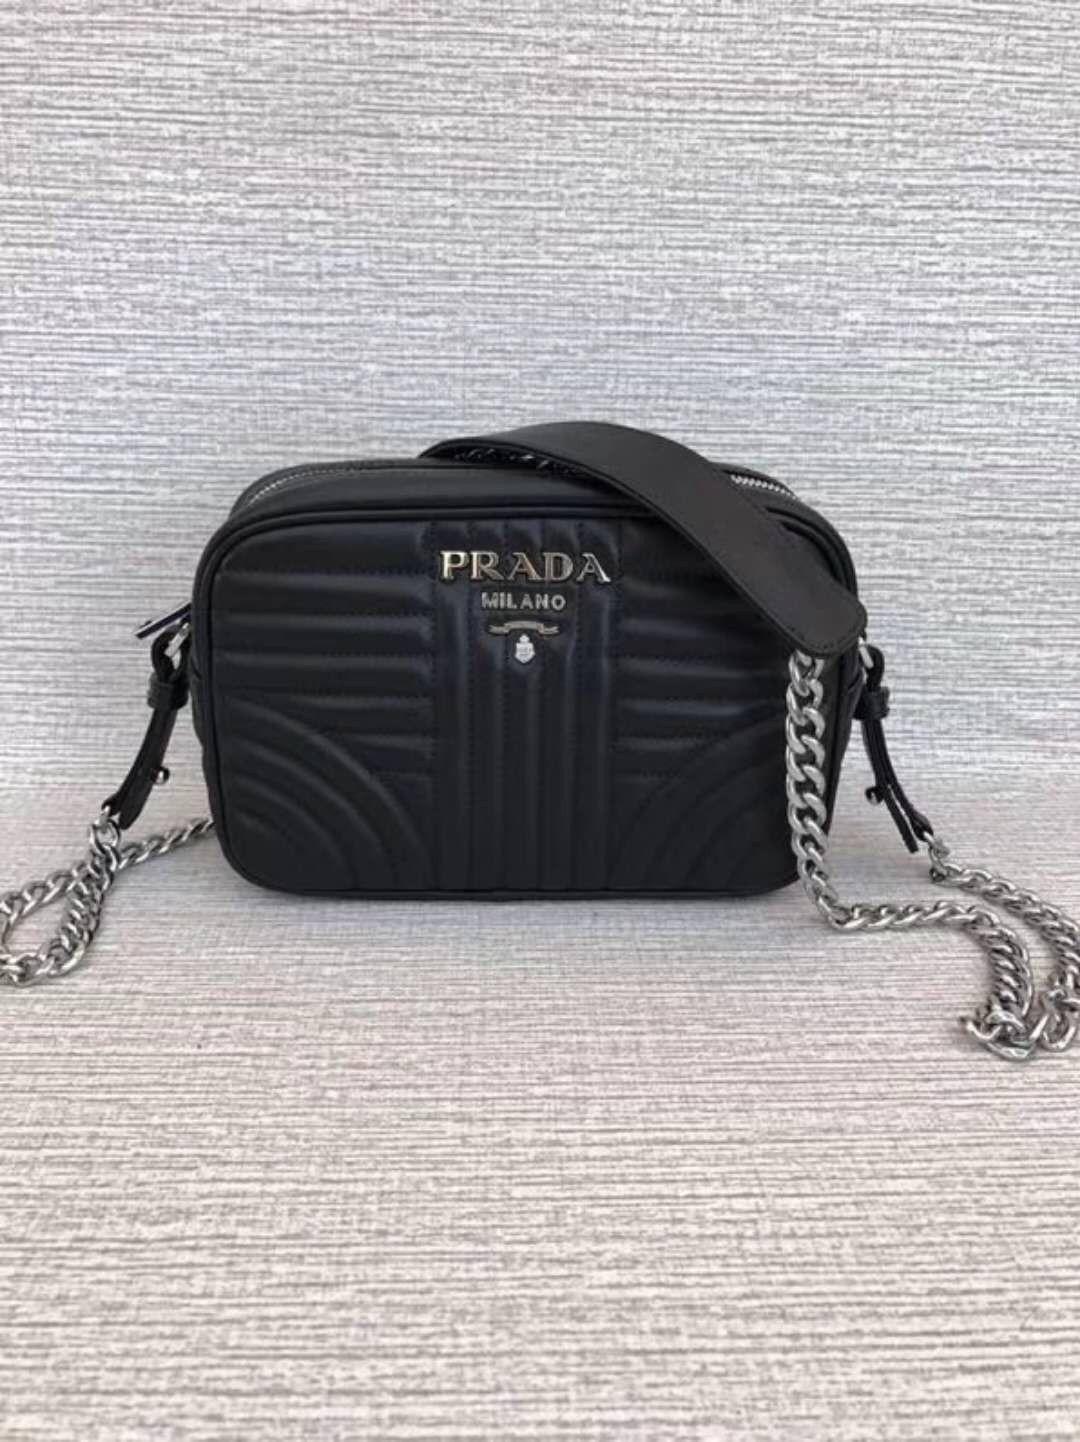 77c13ecb72241c Genuine Prada Diagramme Leather Shoulder Bag Black #blackleatherpursesonsale